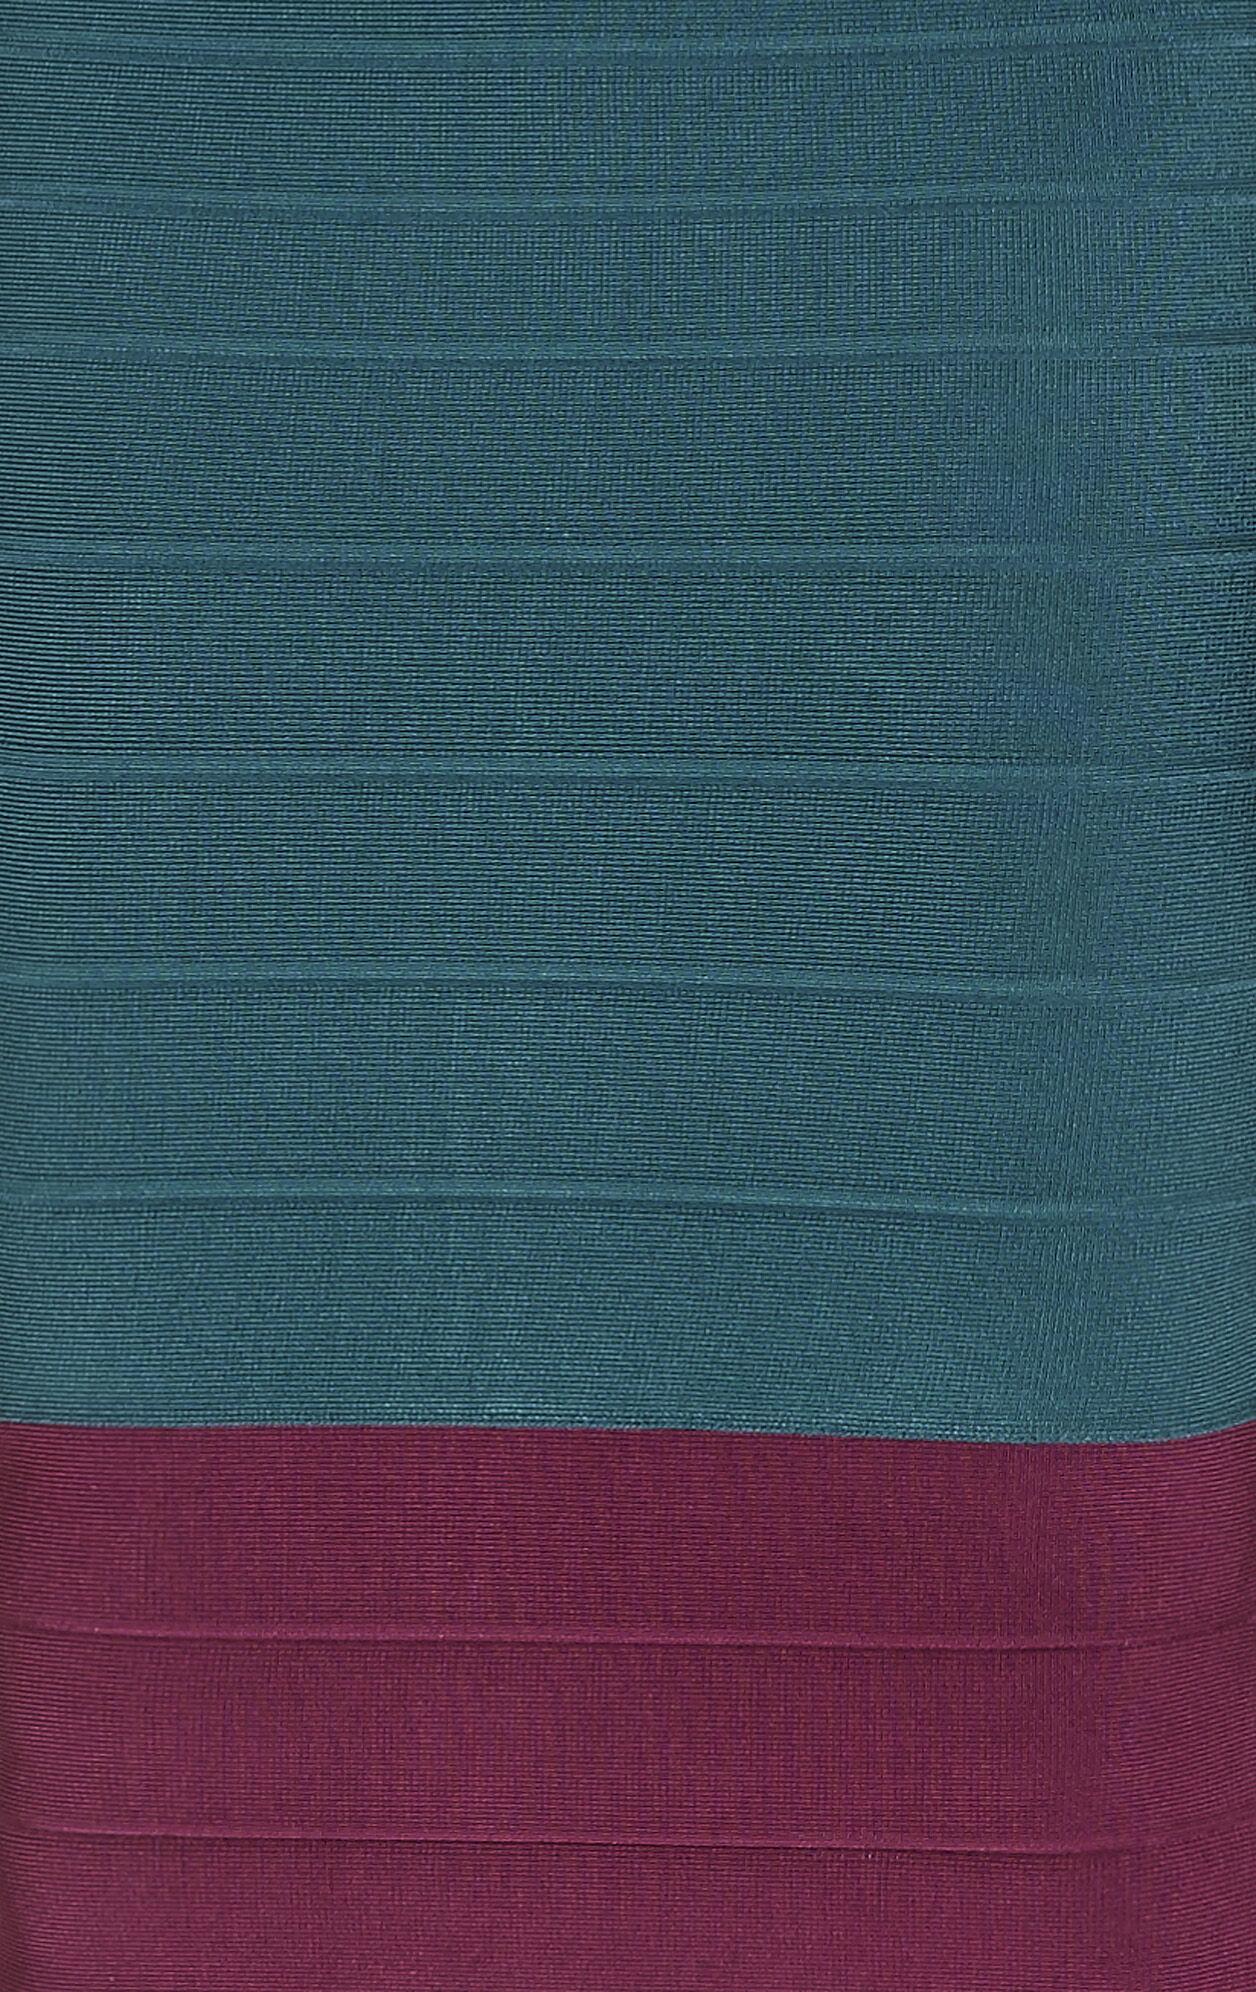 Lania Multi Colorblocked Dress